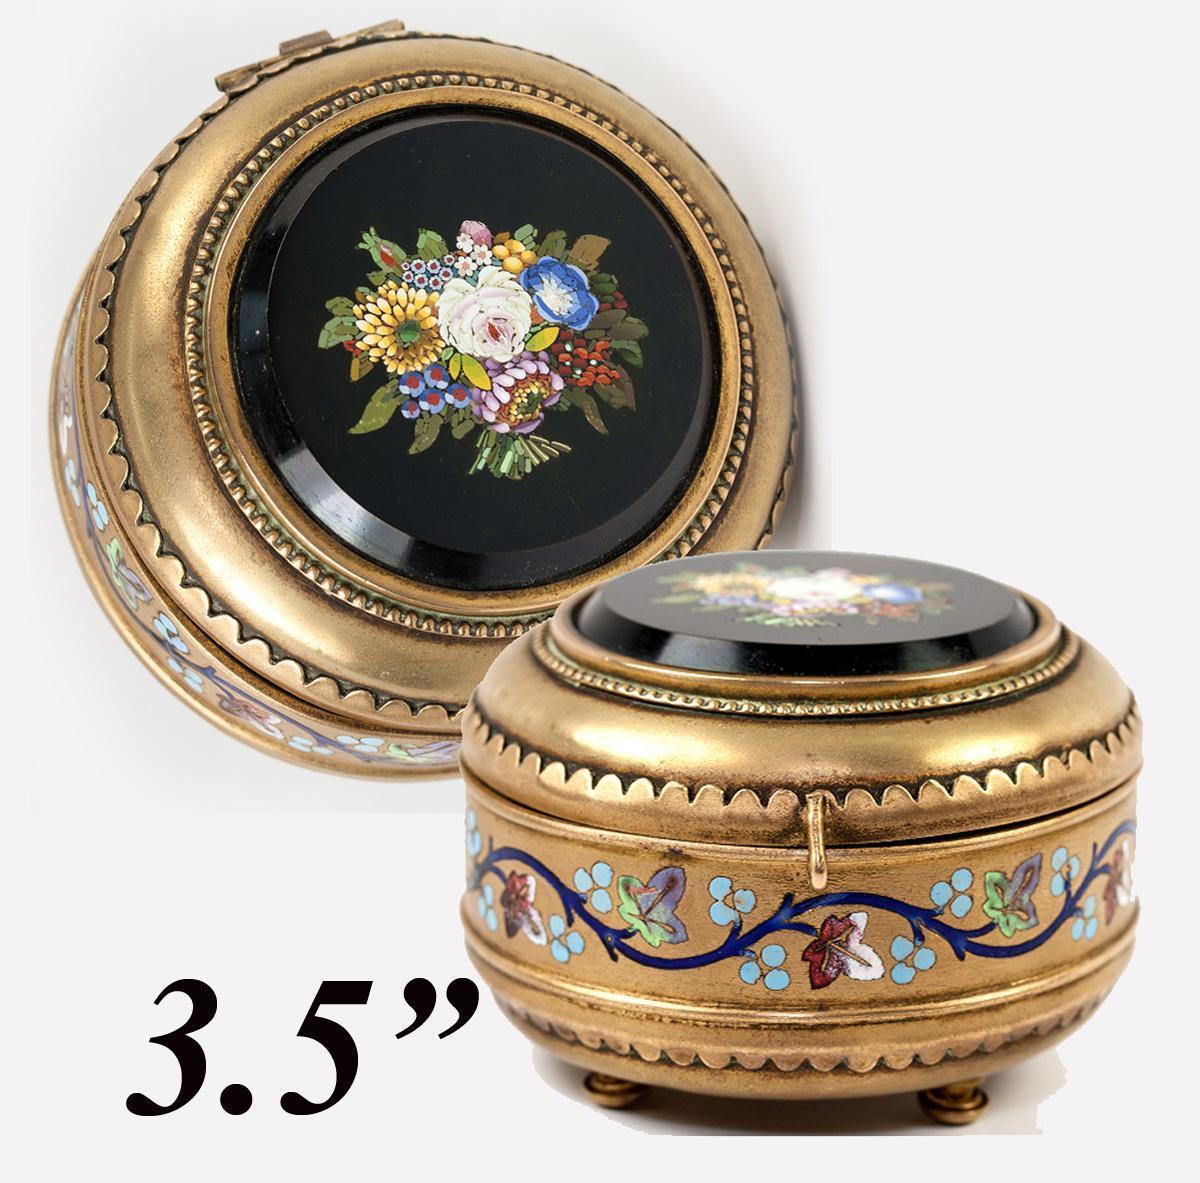 Fine Antique Italian Micromosaic Powder Box, Enamel, Grand Tour c.1840-60s Micro Mosaic Plaque